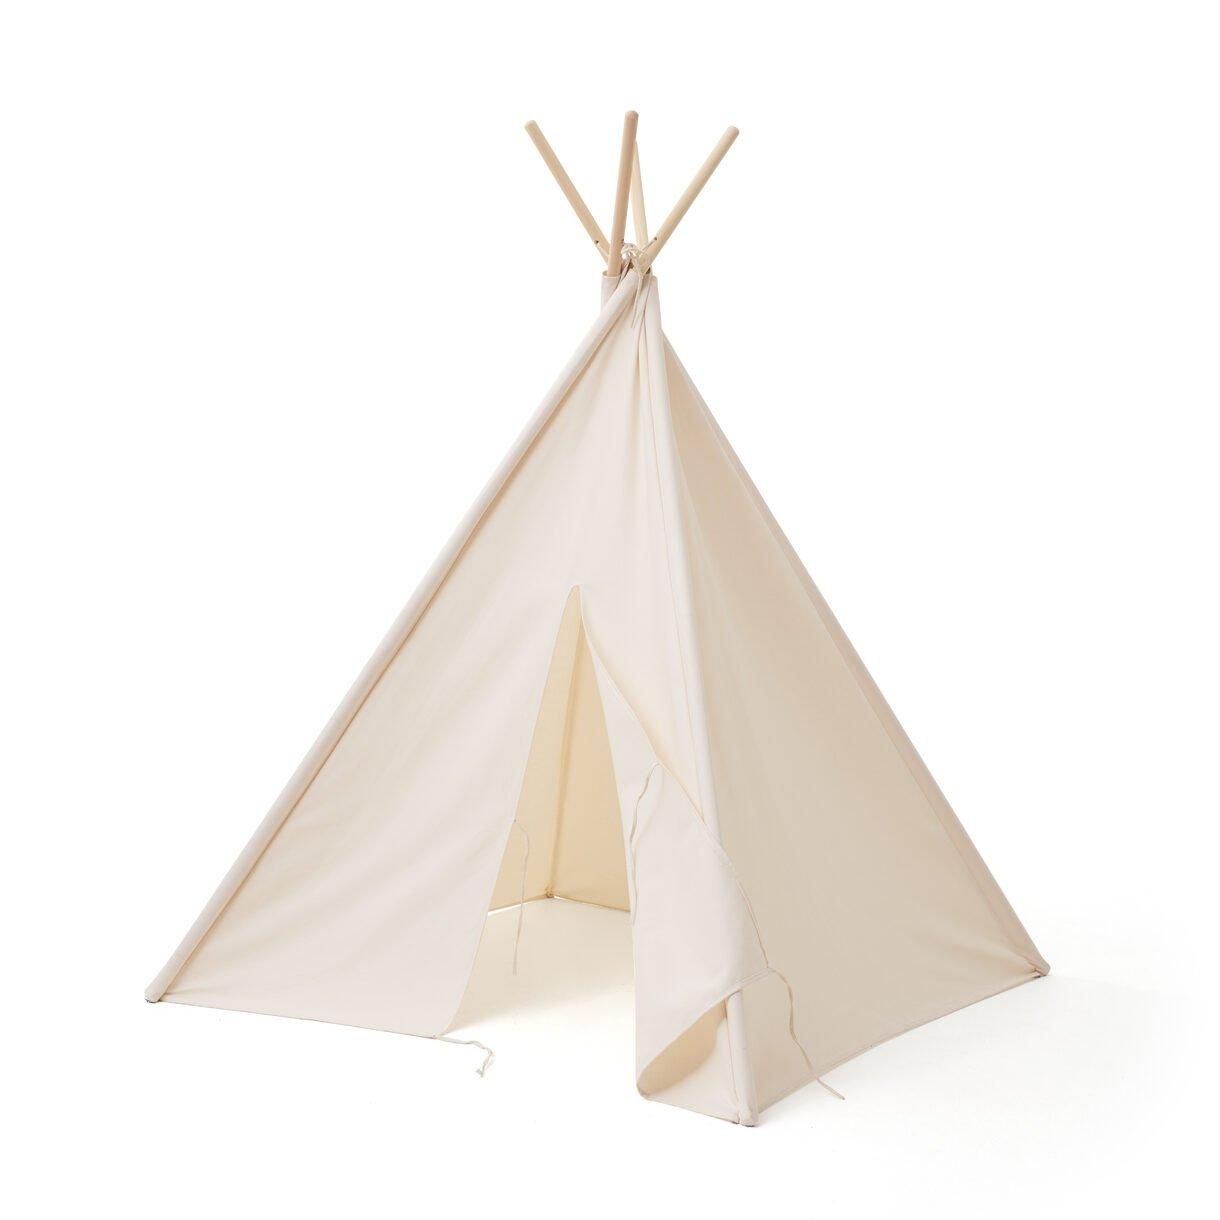 Kids Concept - Tipi Tent - Off White (1000470)